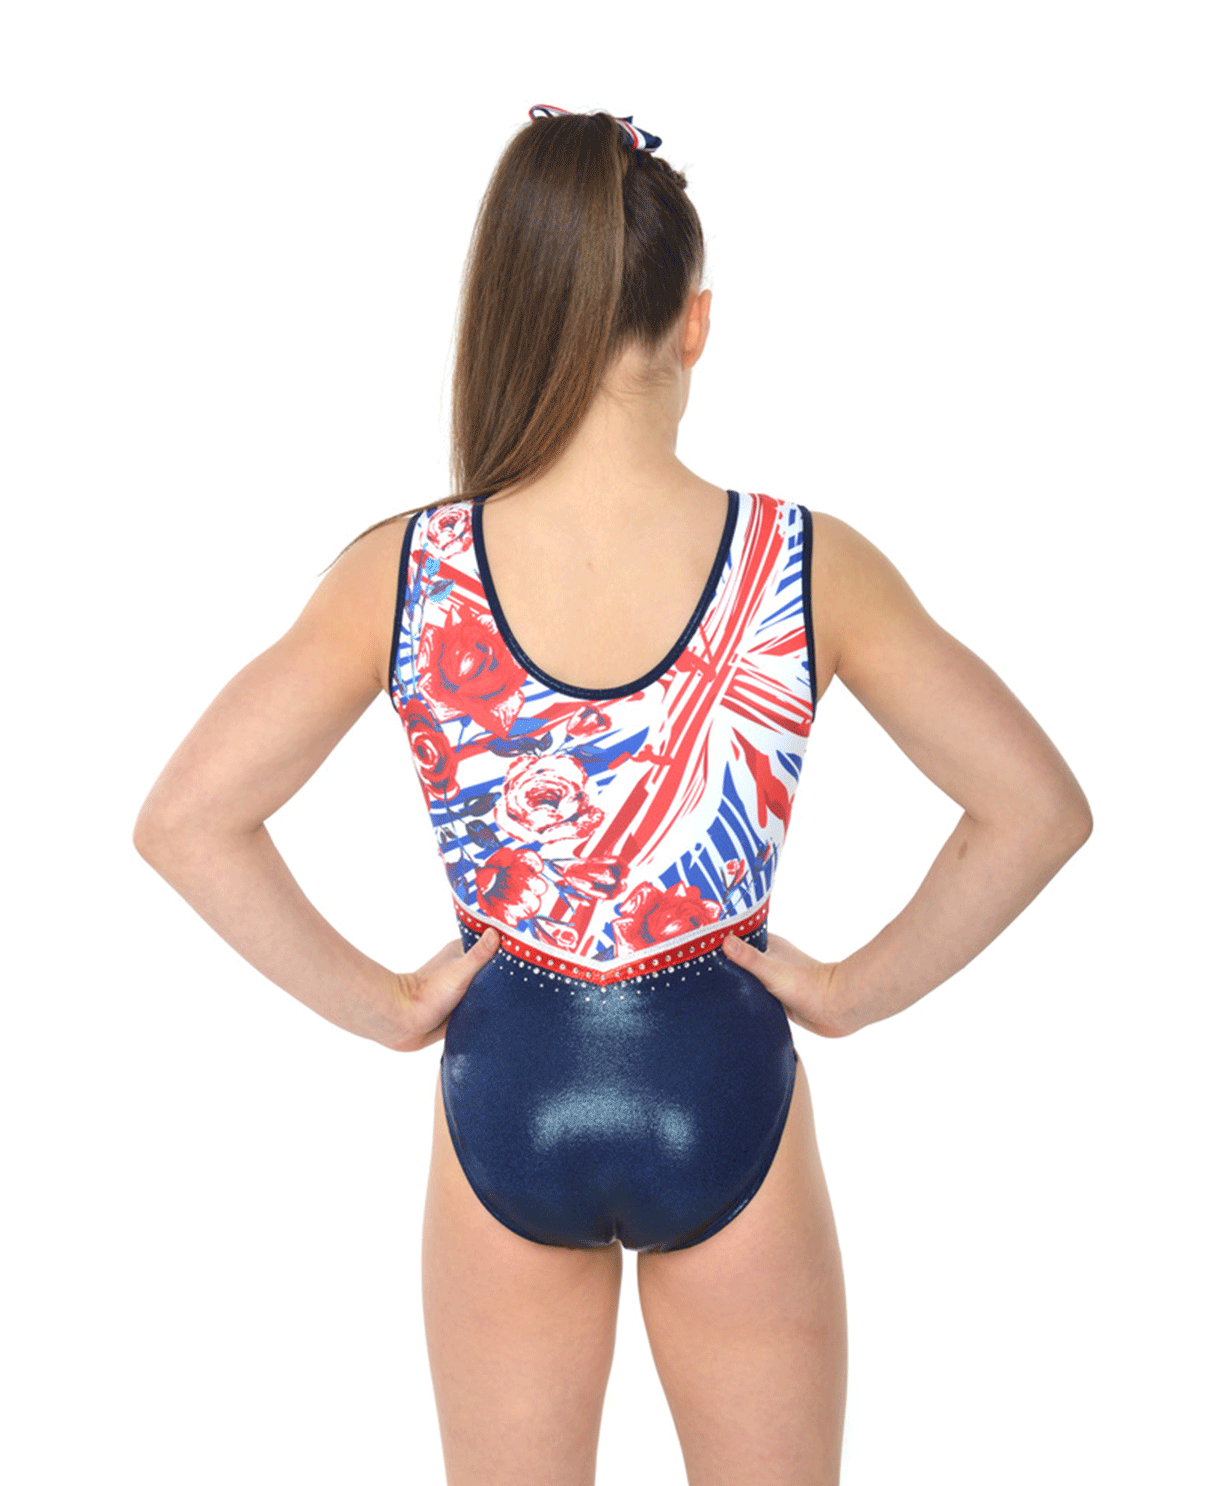 GB Olympic Celebration leotard